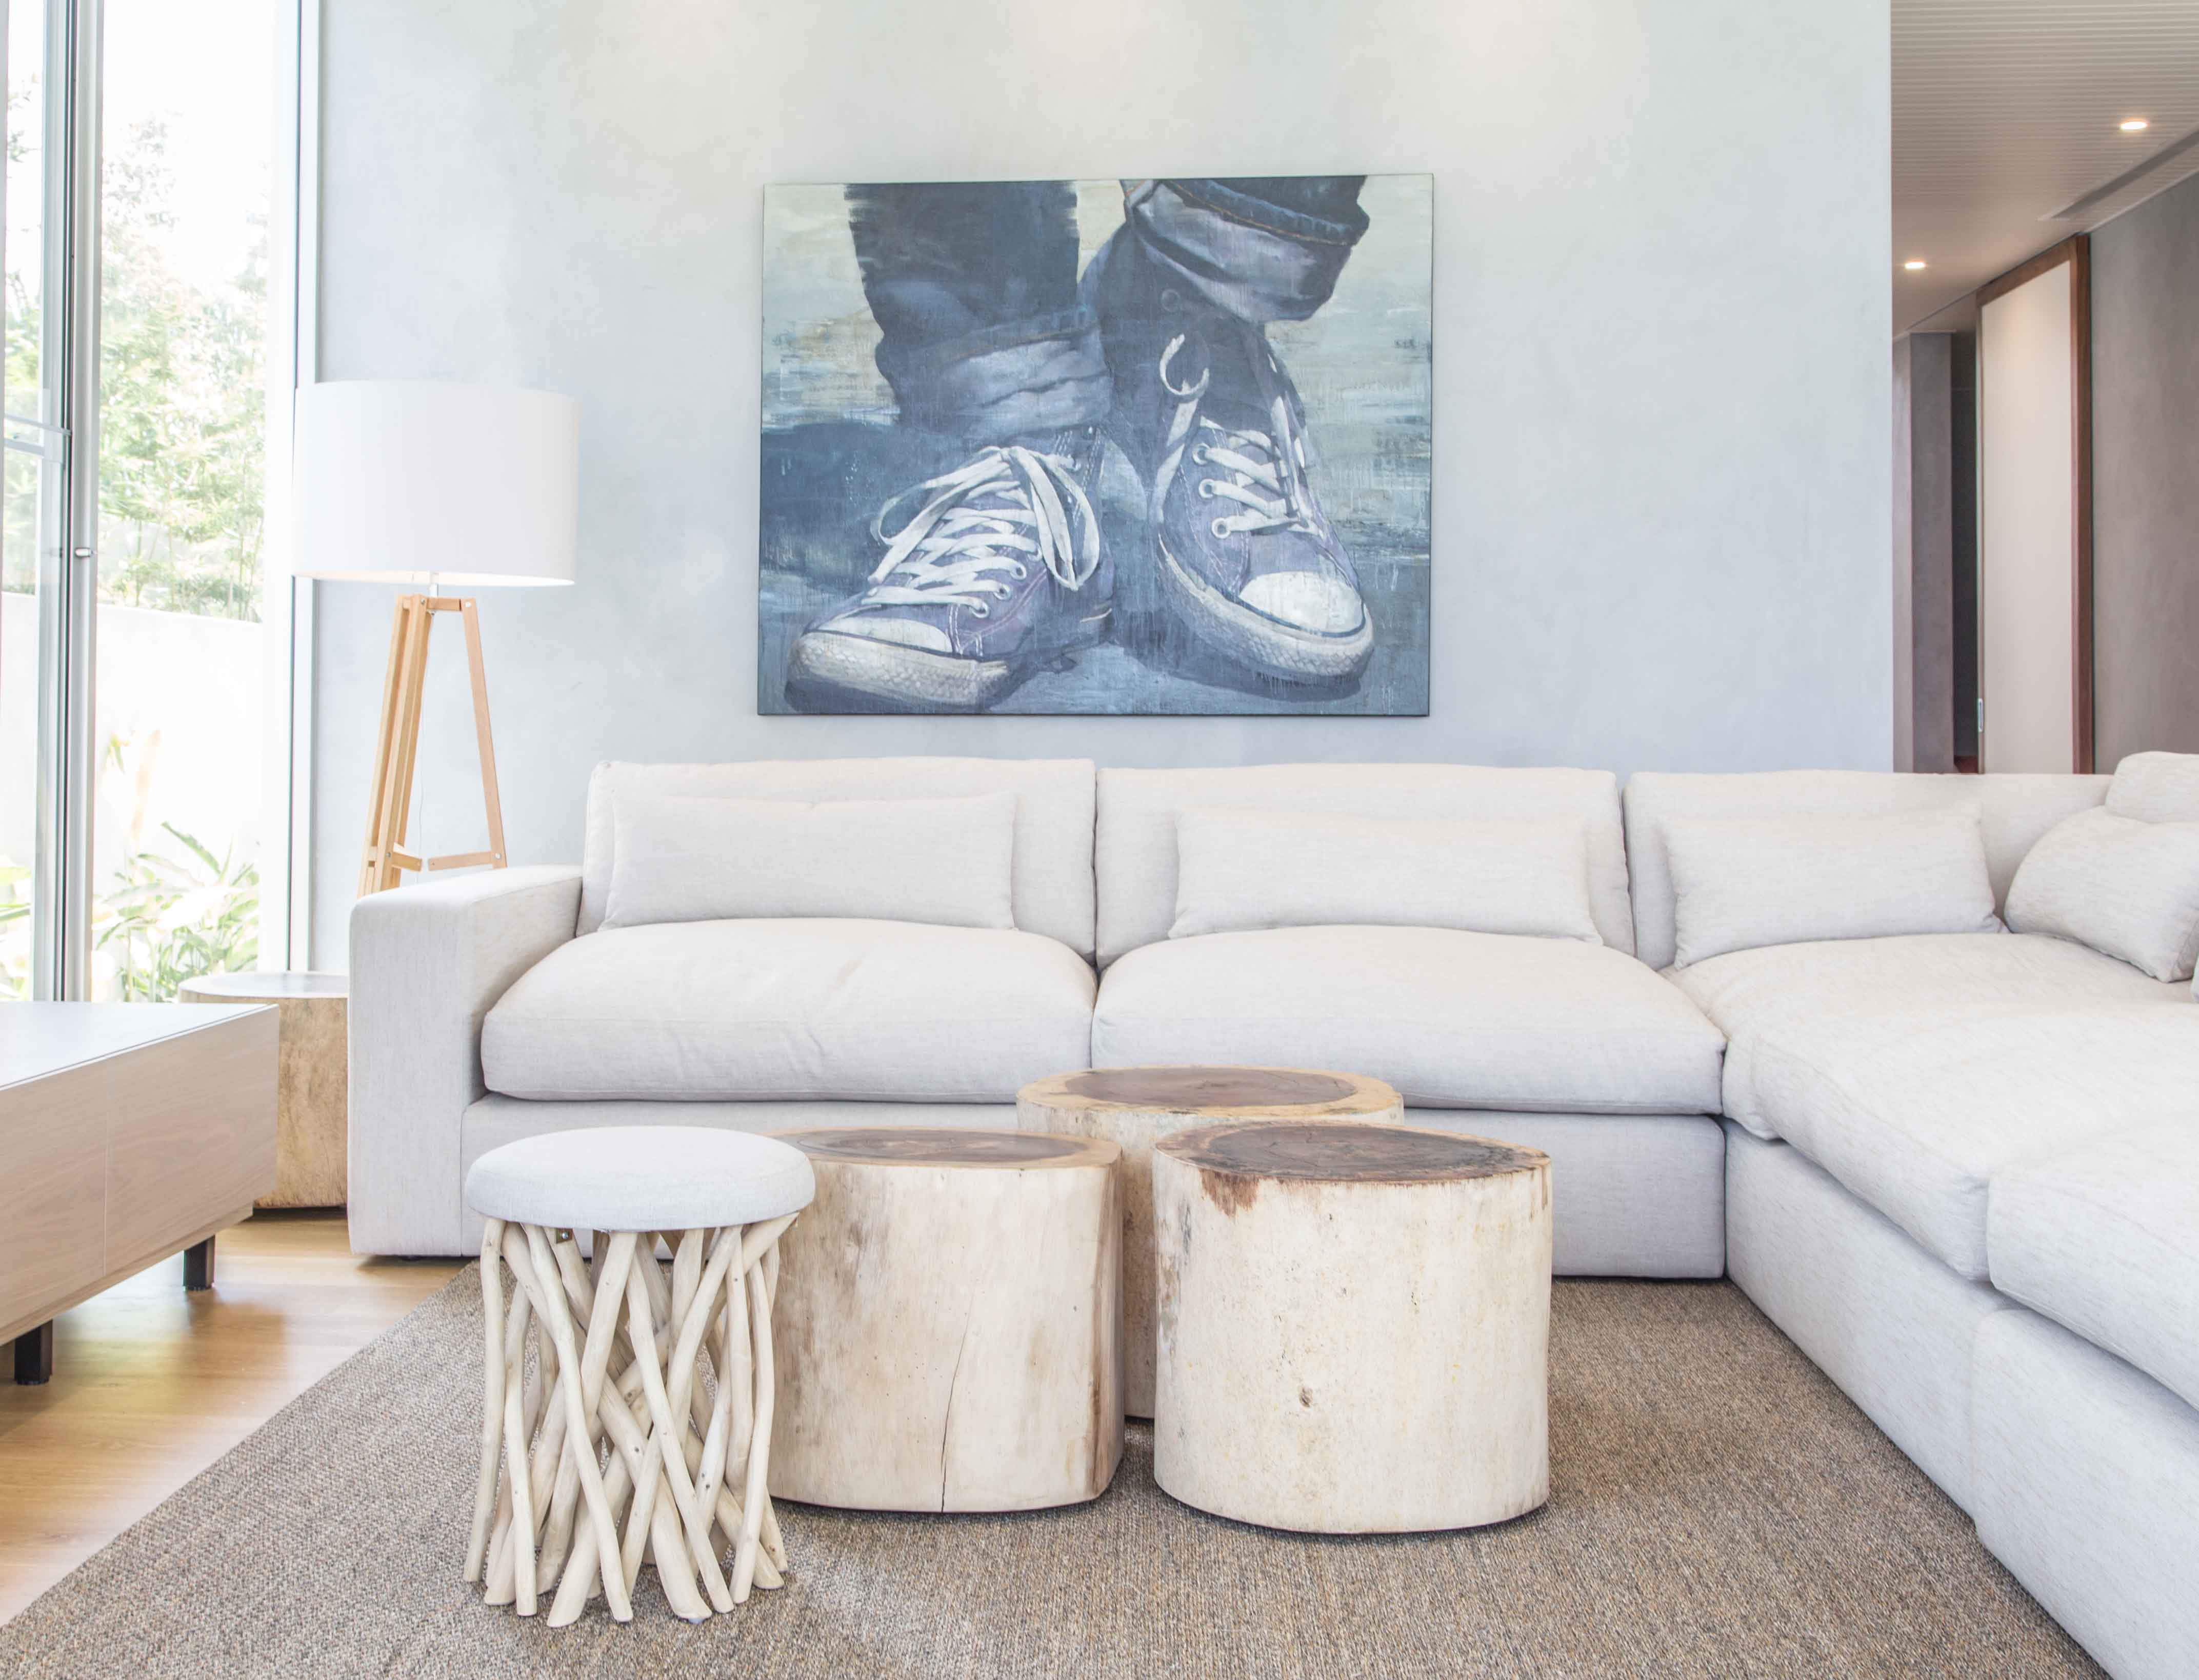 Uniqwa furniture trade supplier of designer furniture for D furniture galleries closing